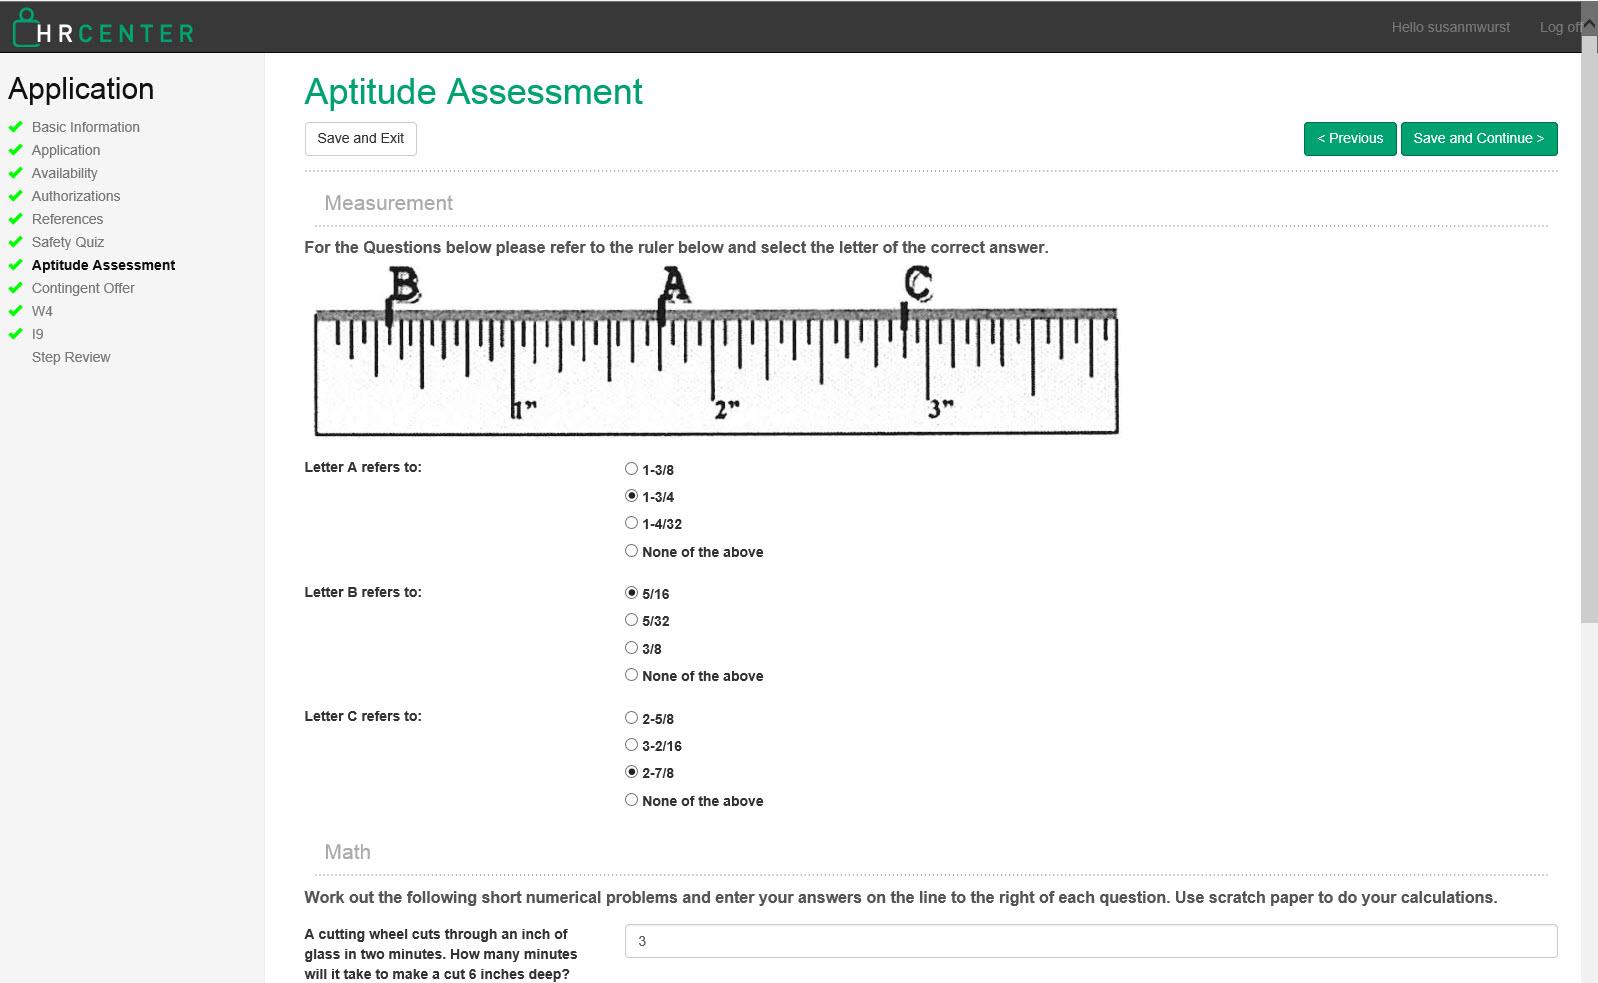 Aptitude assessment